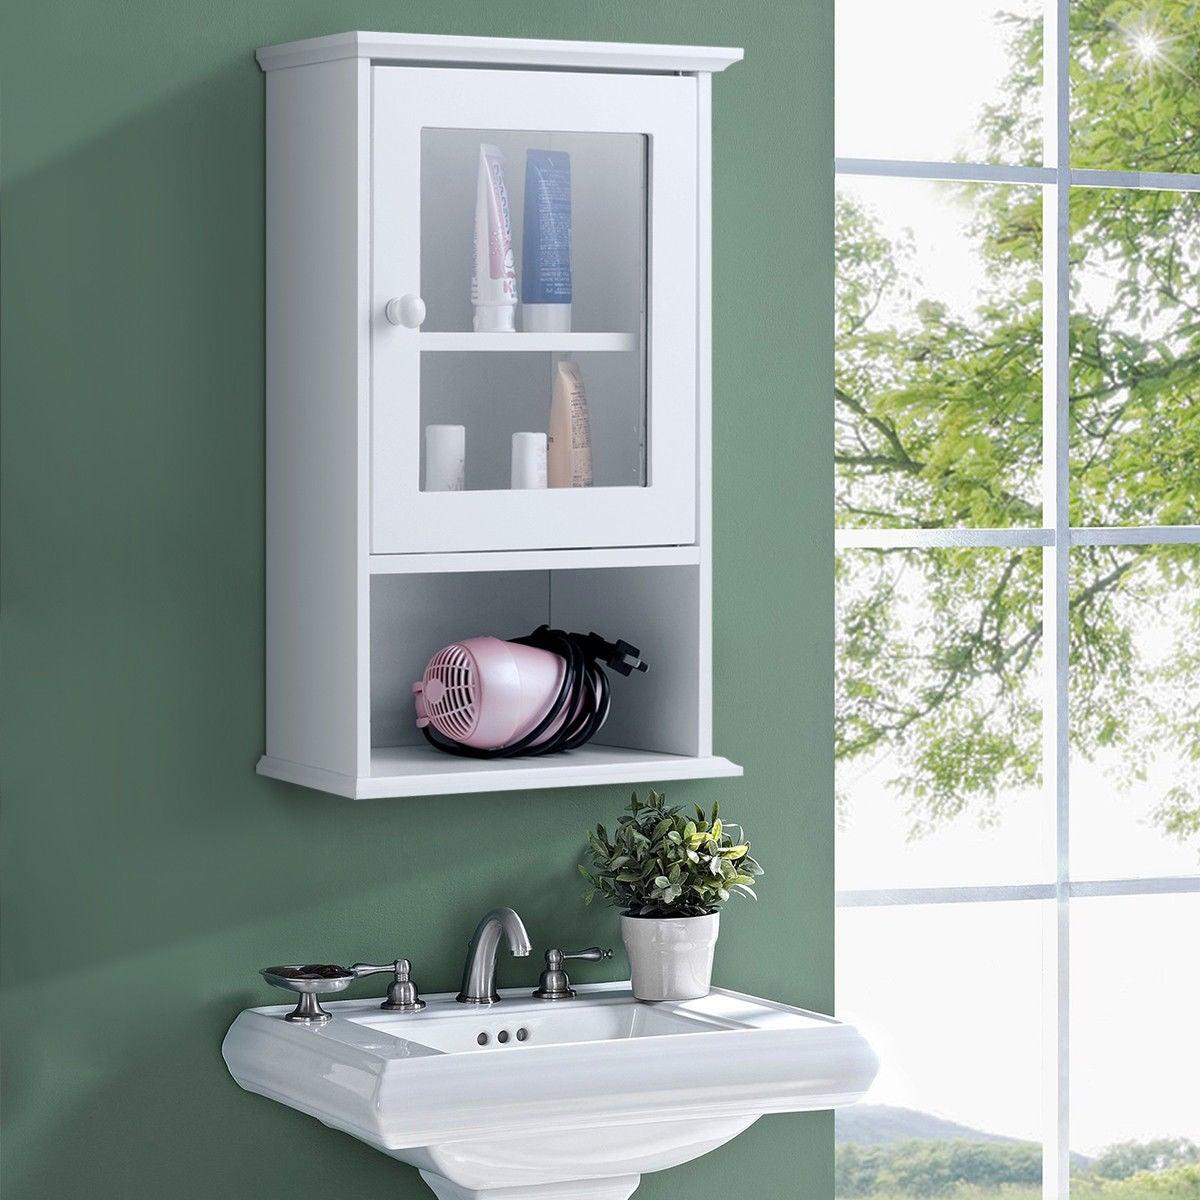 Gymax Wall Mounted Bathroom Cabinet Storage Organize Hanging Medicine Adjustable Shelf regarding proportions 1200 X 1200